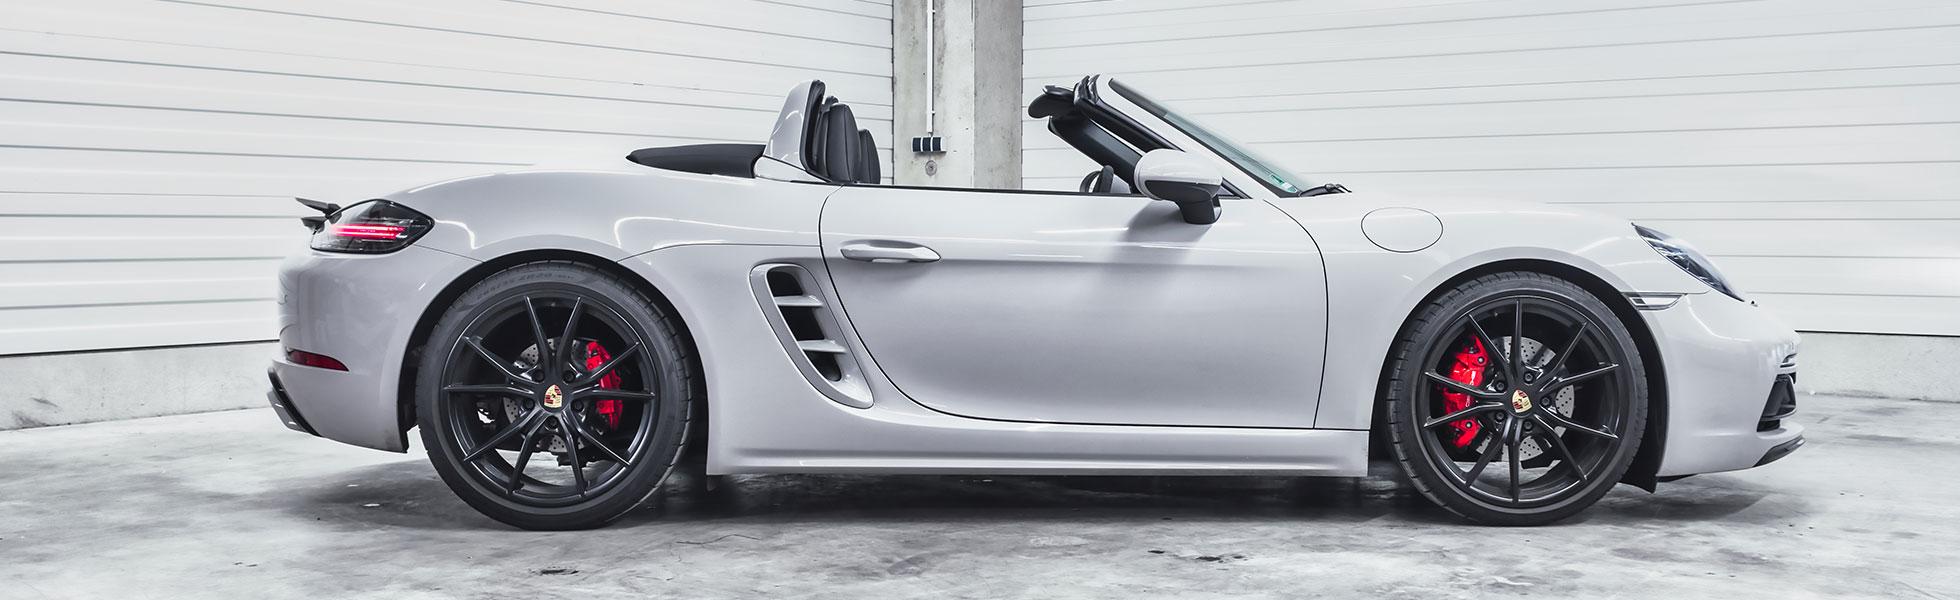 Porsche Boxster/Cayman Buy Rims & Complete Wheels